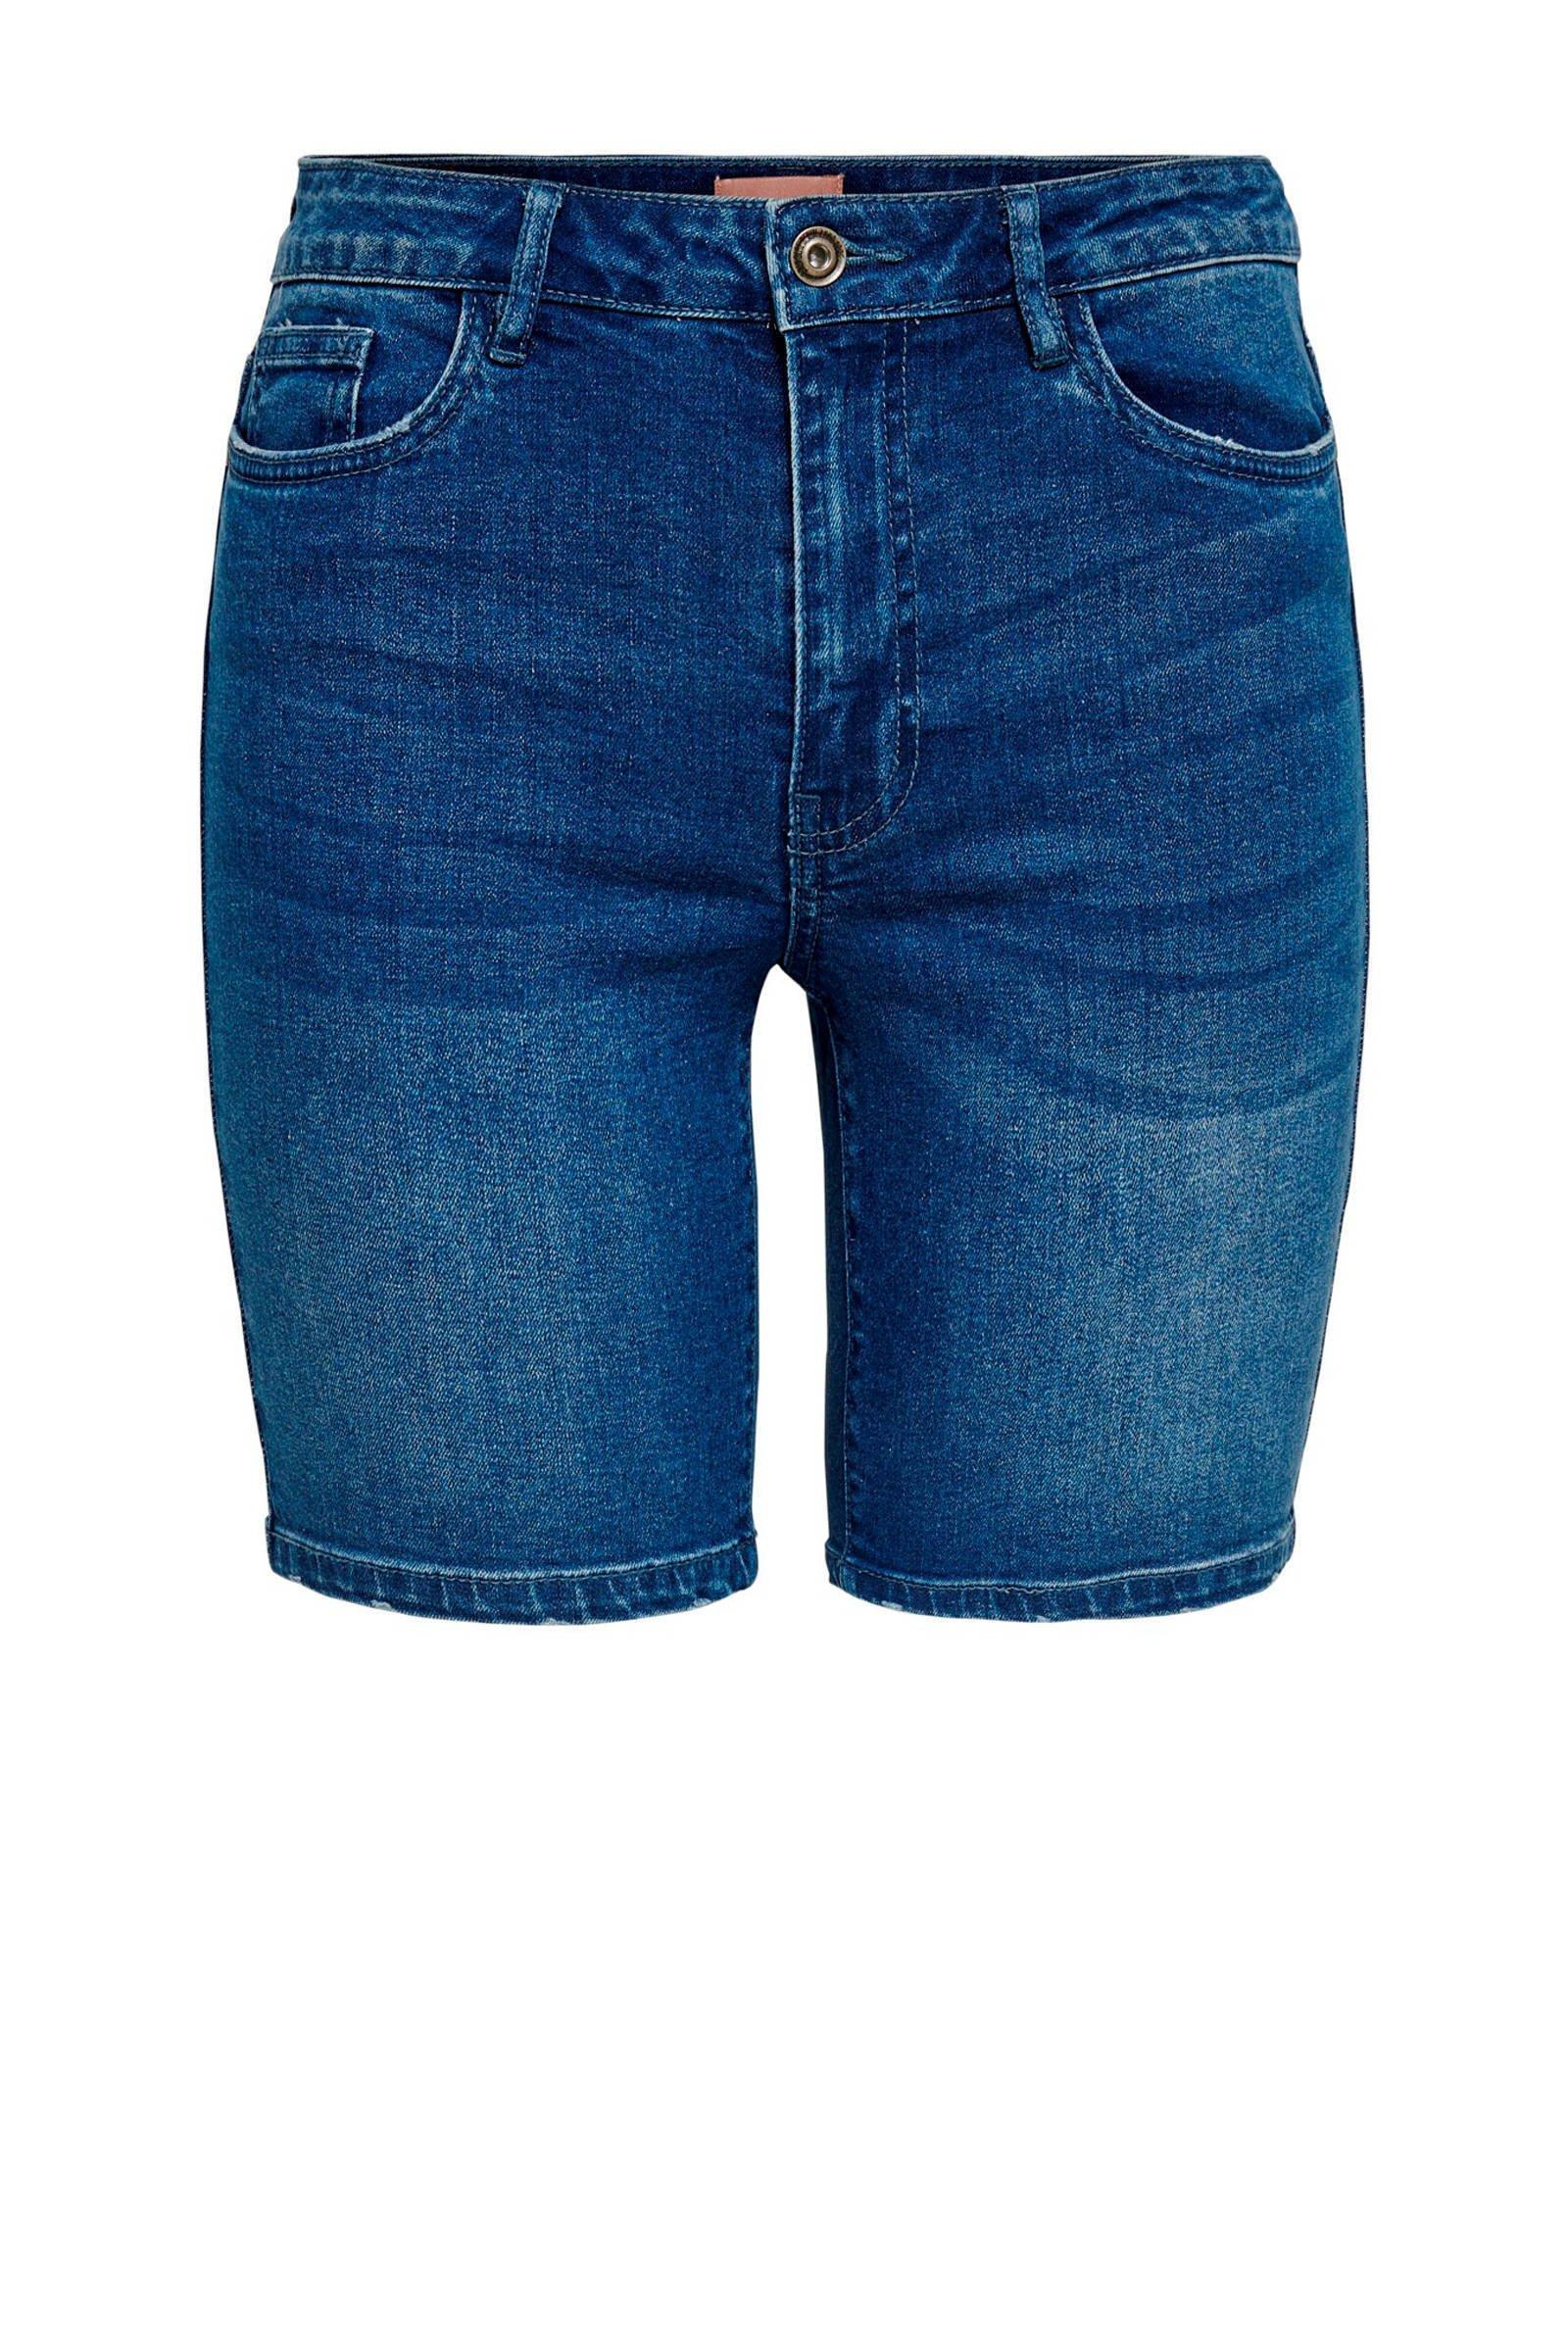 Korte Broek Dames Jeans.Only Korte Broek Denim Wehkamp